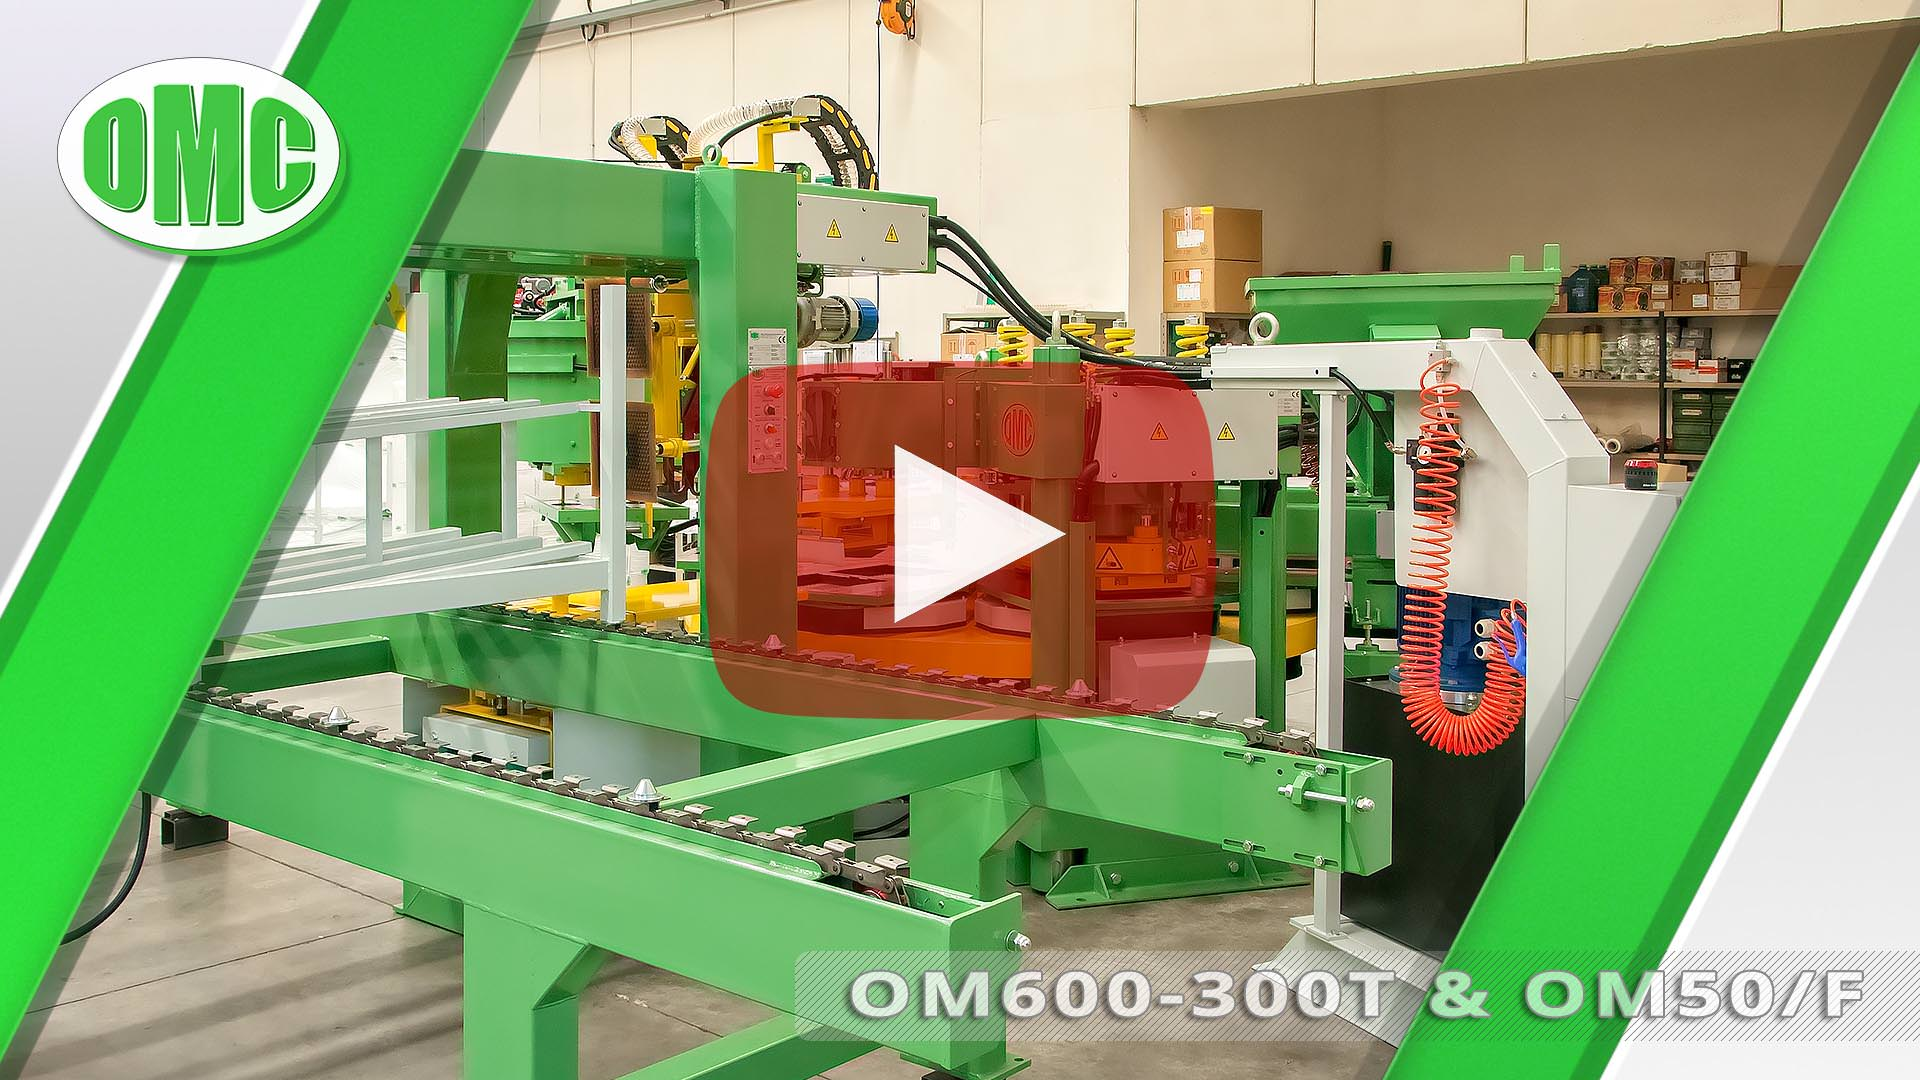 Pressa Rotativa Automatica Mod.OM600-300T con Mod. OM50/F (33x33x2)